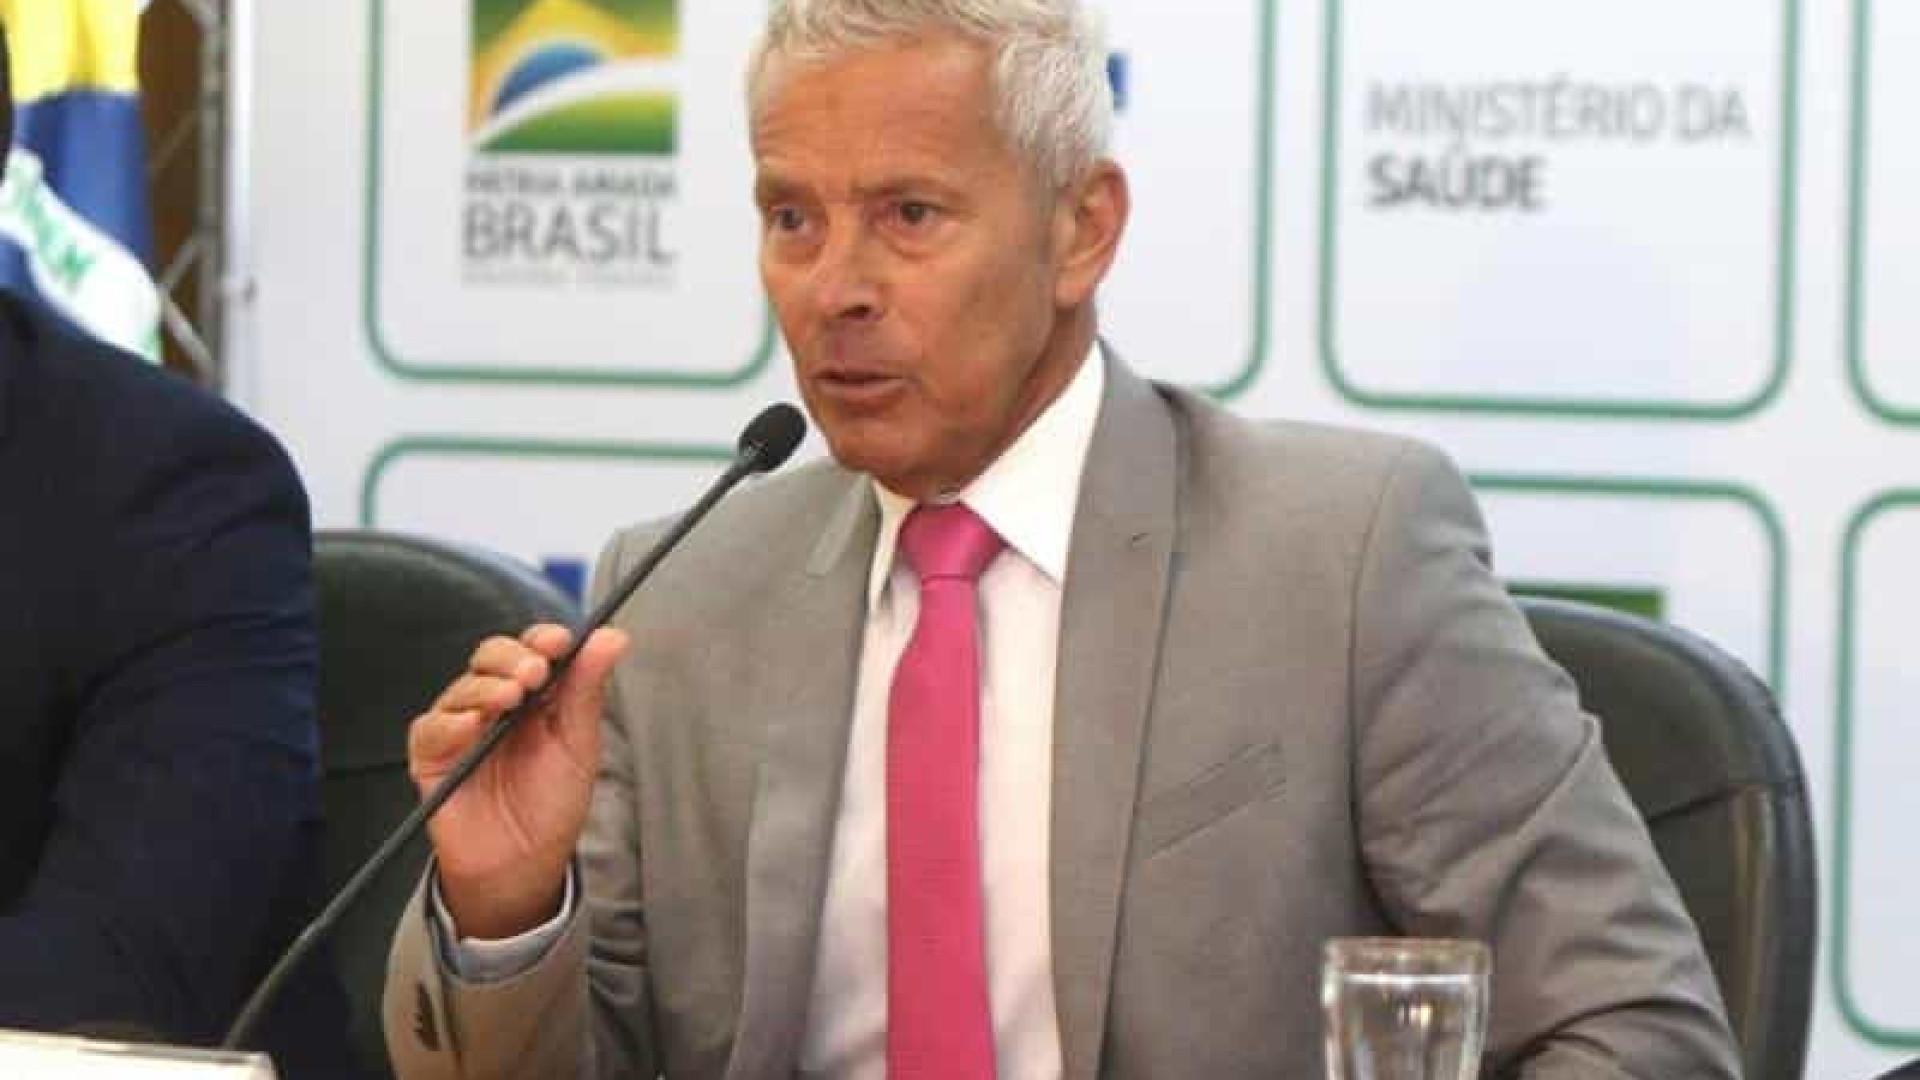 Saúde sinaliza retirada de brasileiros da China mesmo sem lei